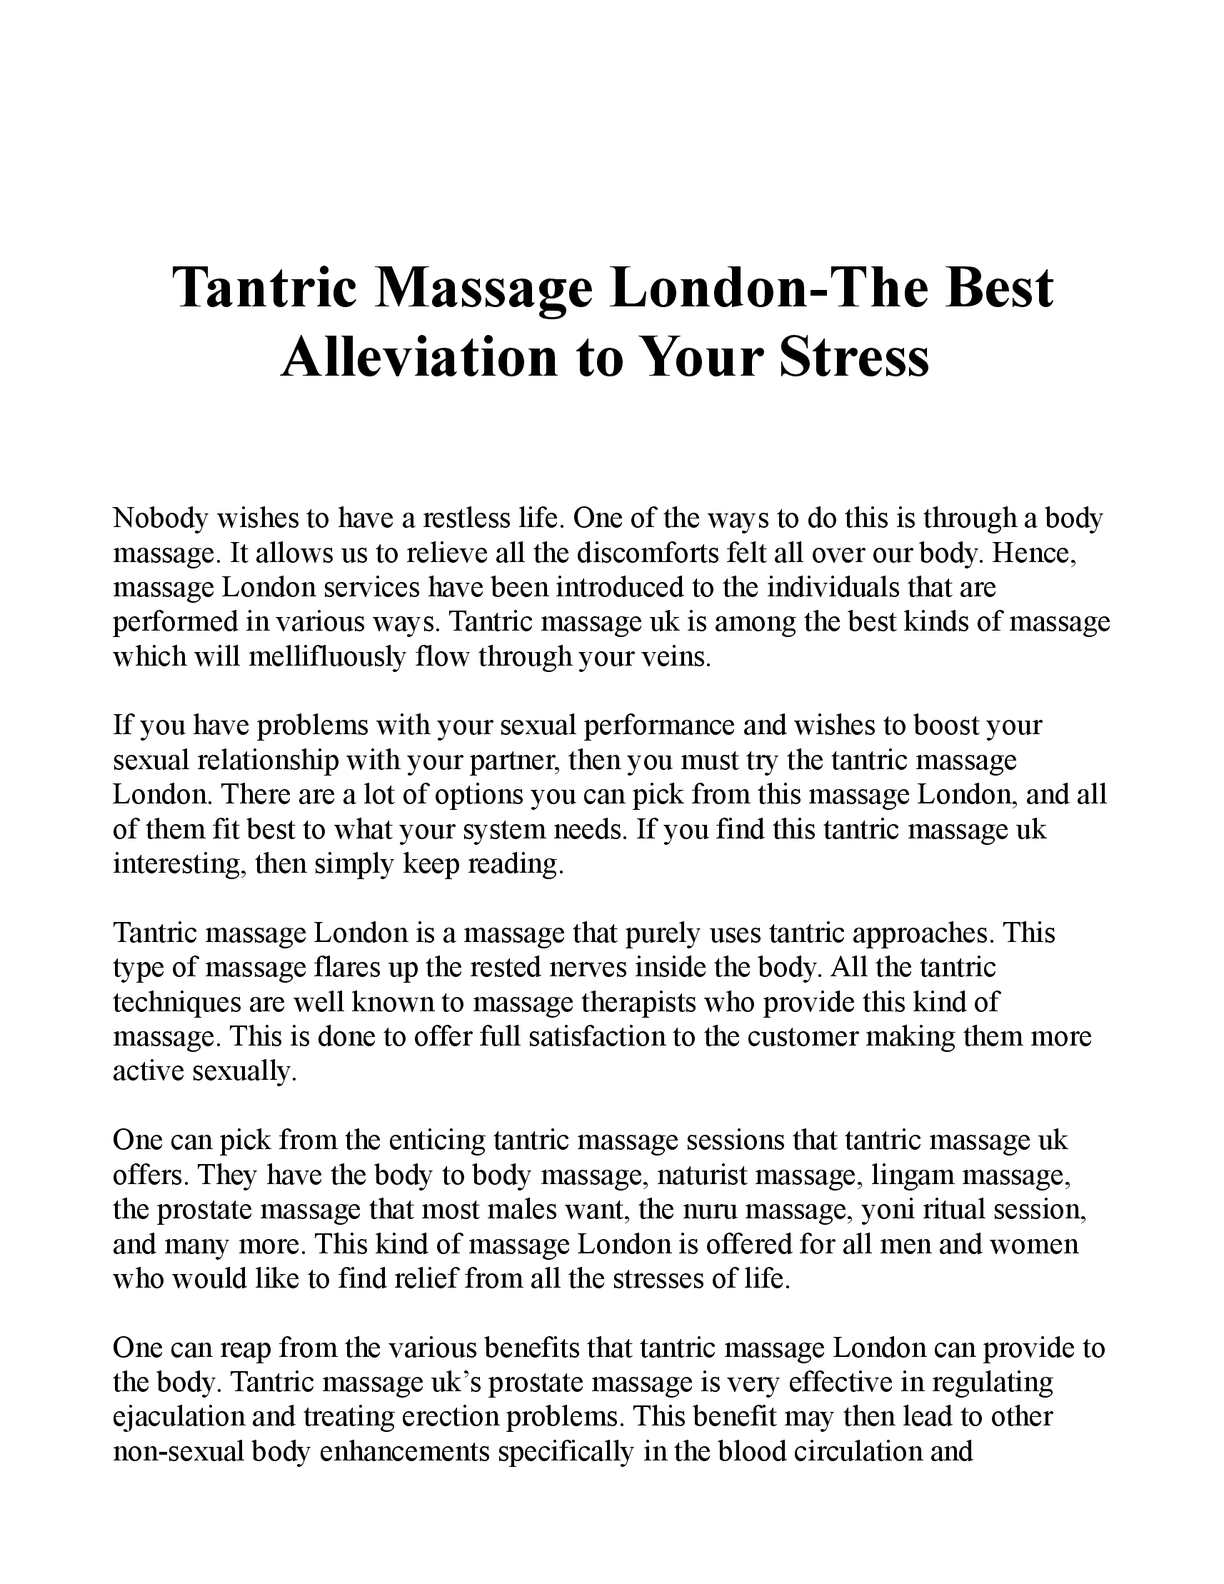 Massage what is lingam Lingam Massage: